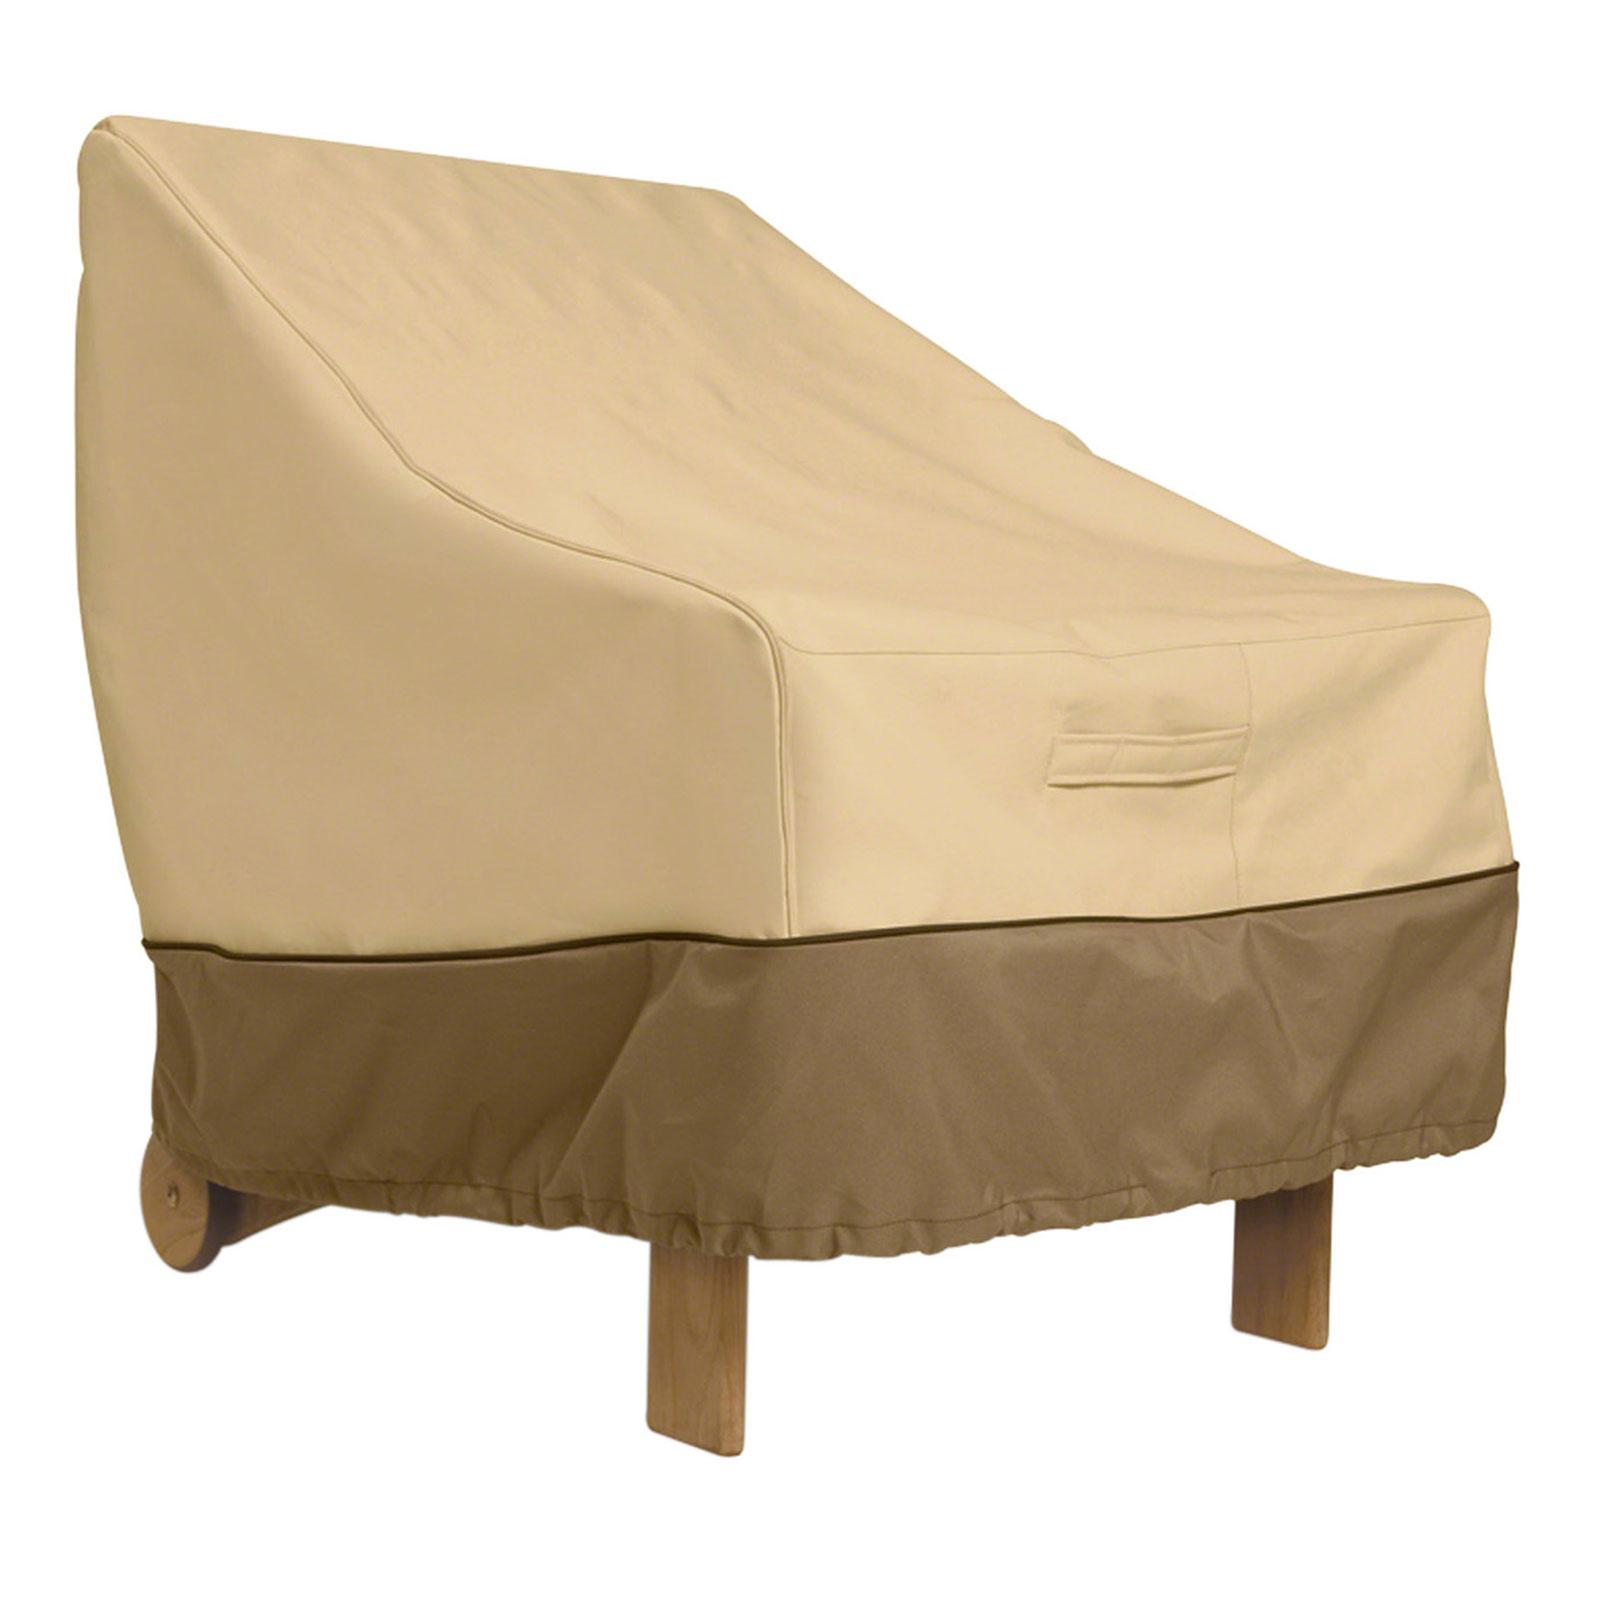 Lounge Chair Cover  Veranda in Patio Furniture Covers